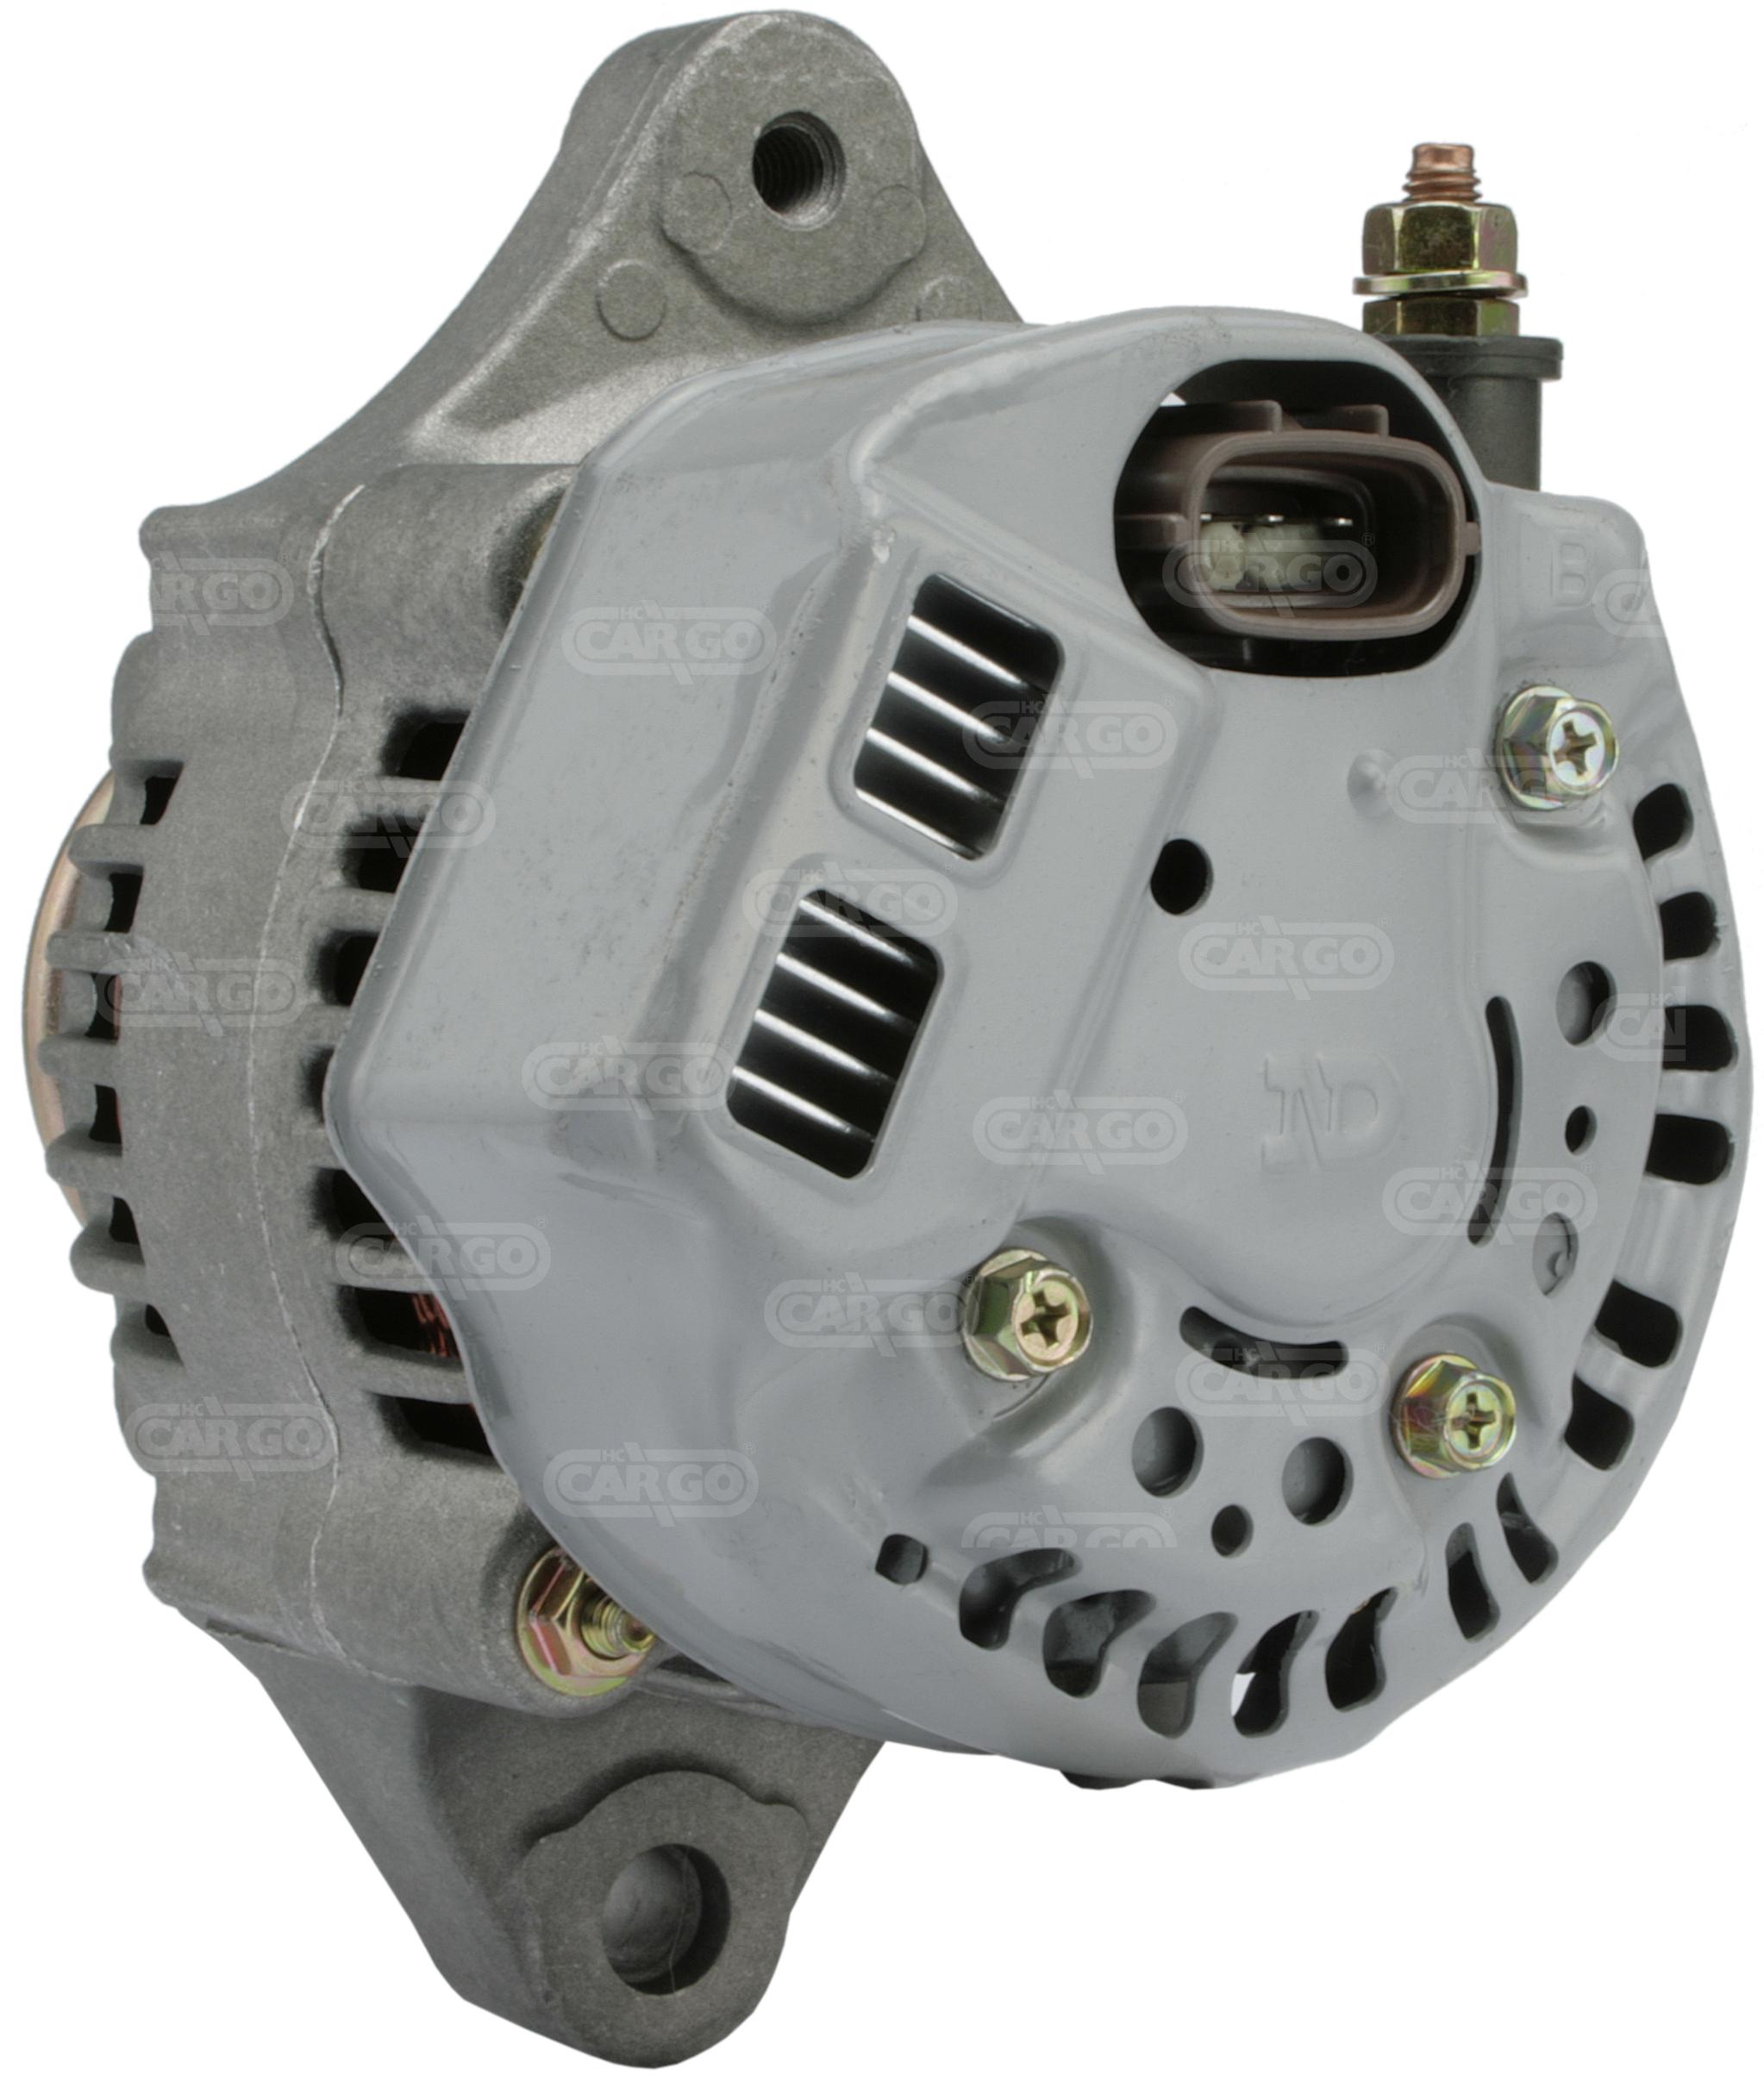 Alternateur 742 Voltage14 Amp40